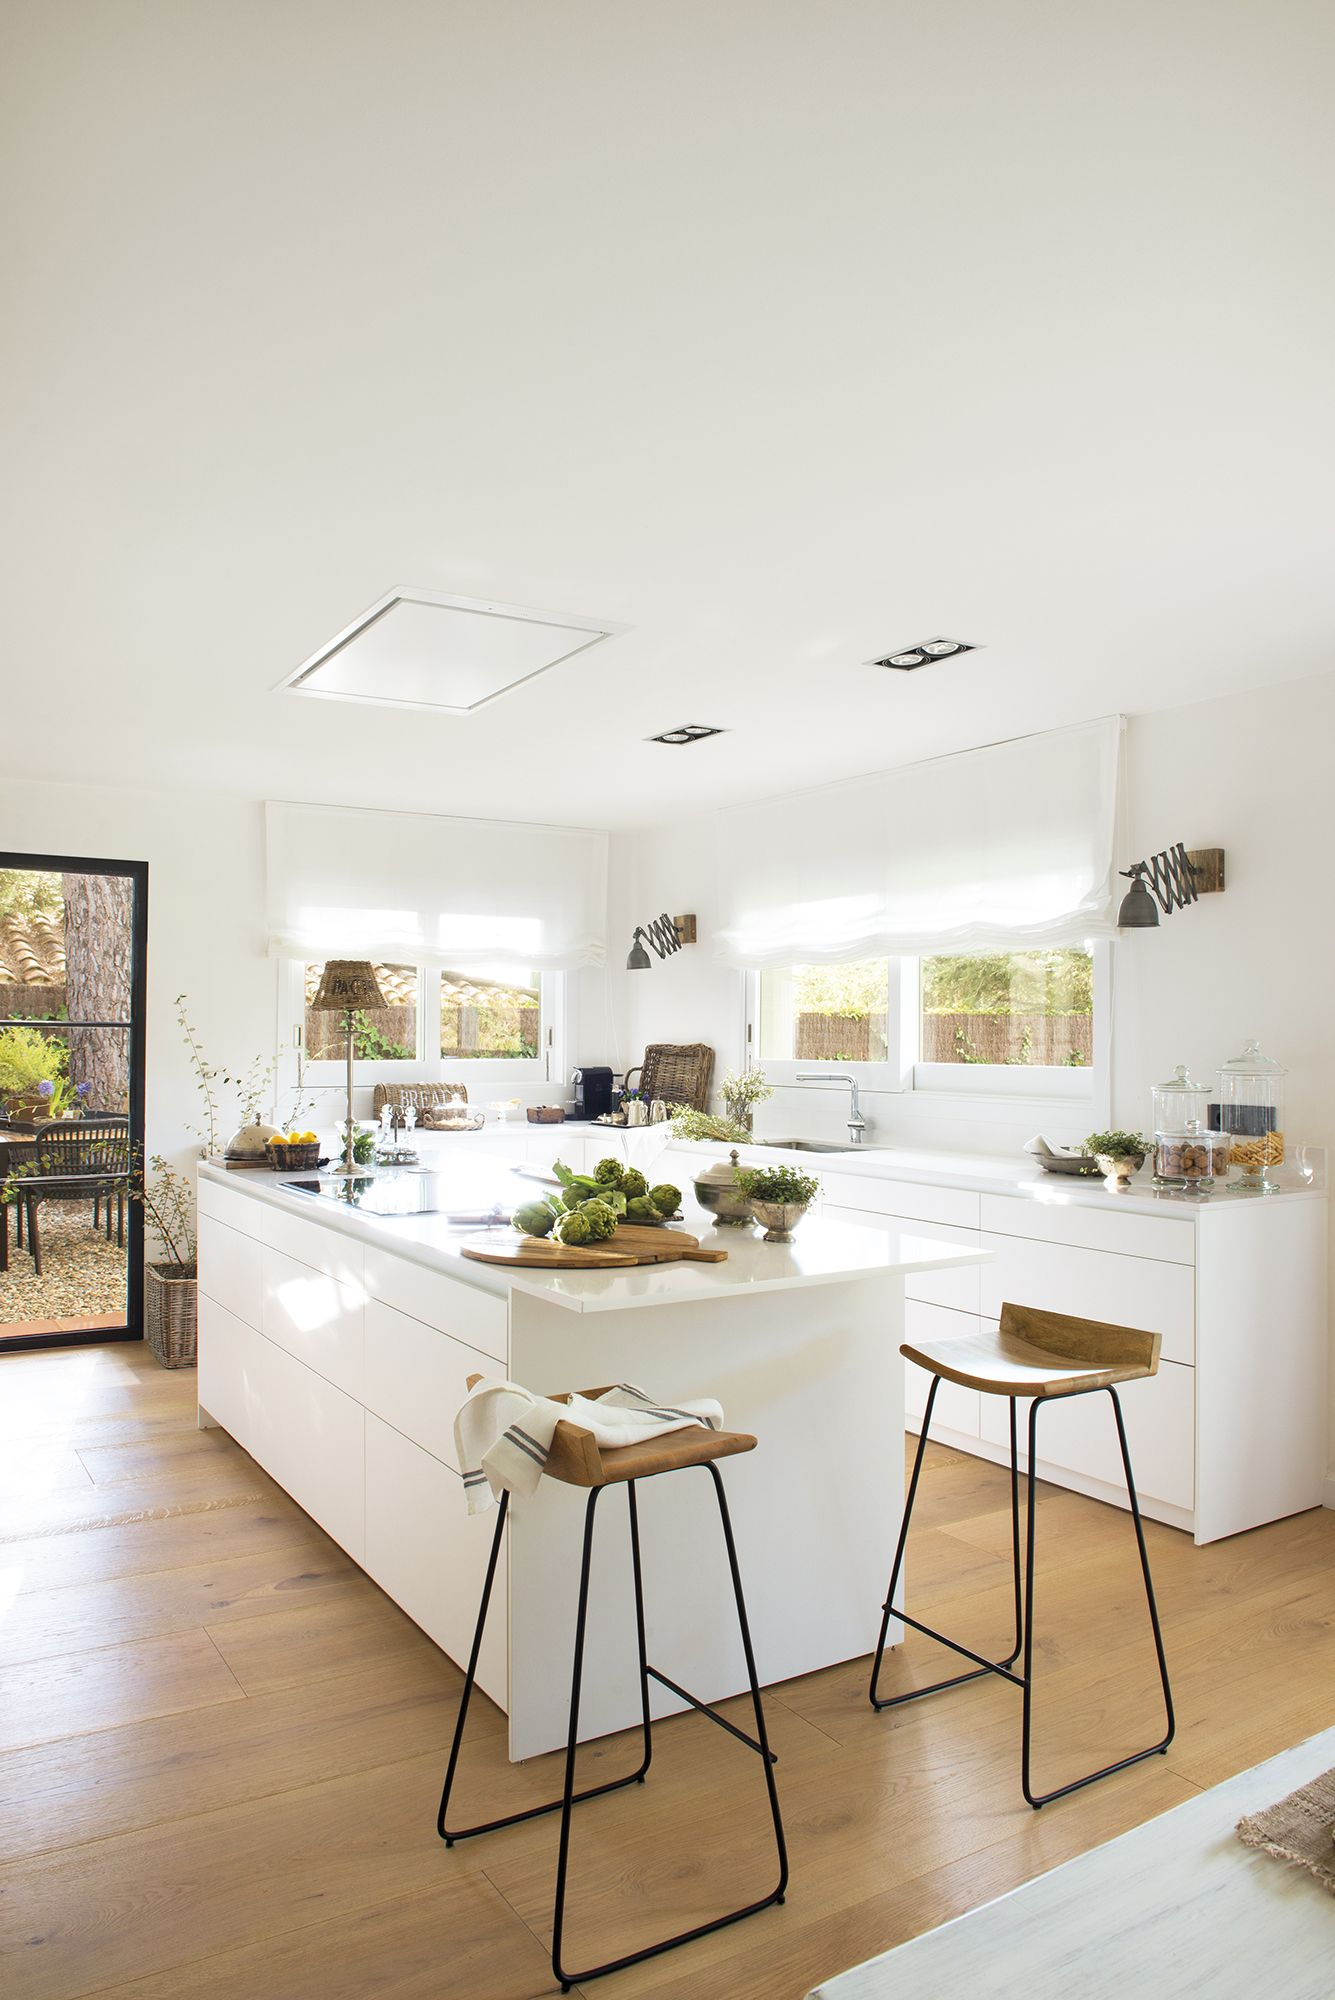 Espacios Confortables Interieur Moderne De Cuisine Decoration Interieure Cuisine Cuisine Moderne